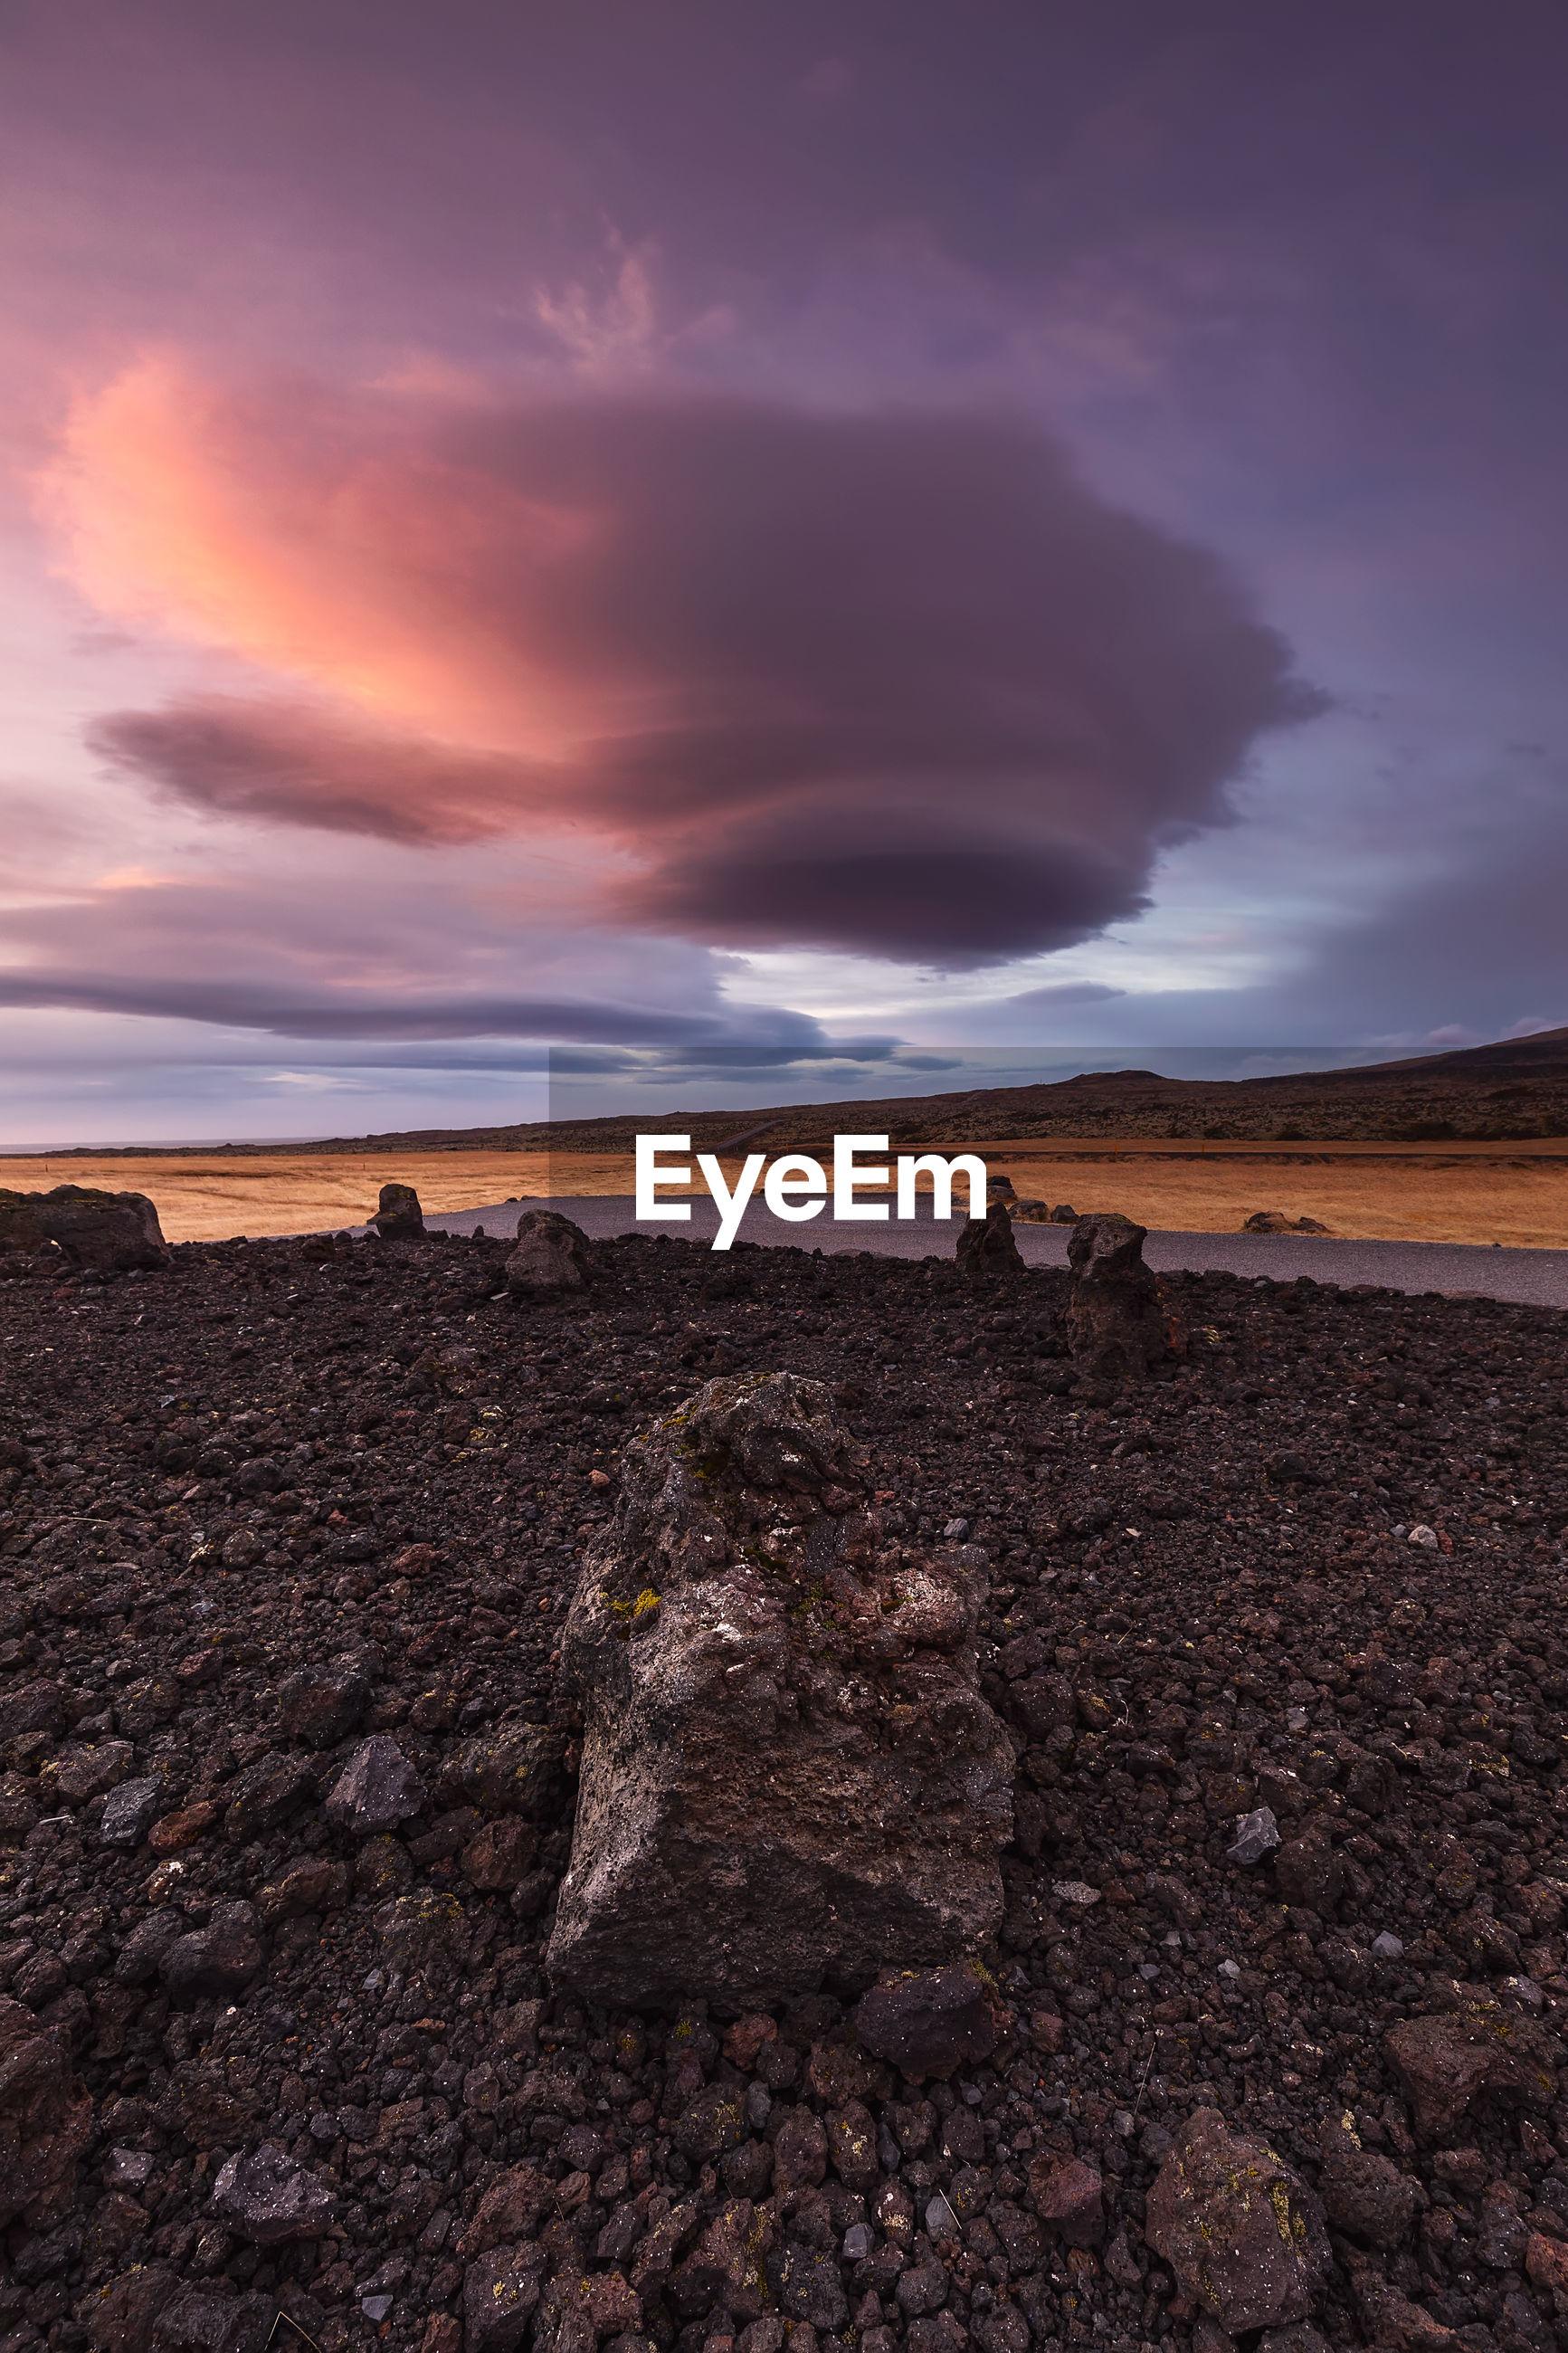 Rocks on land against sky during sunset